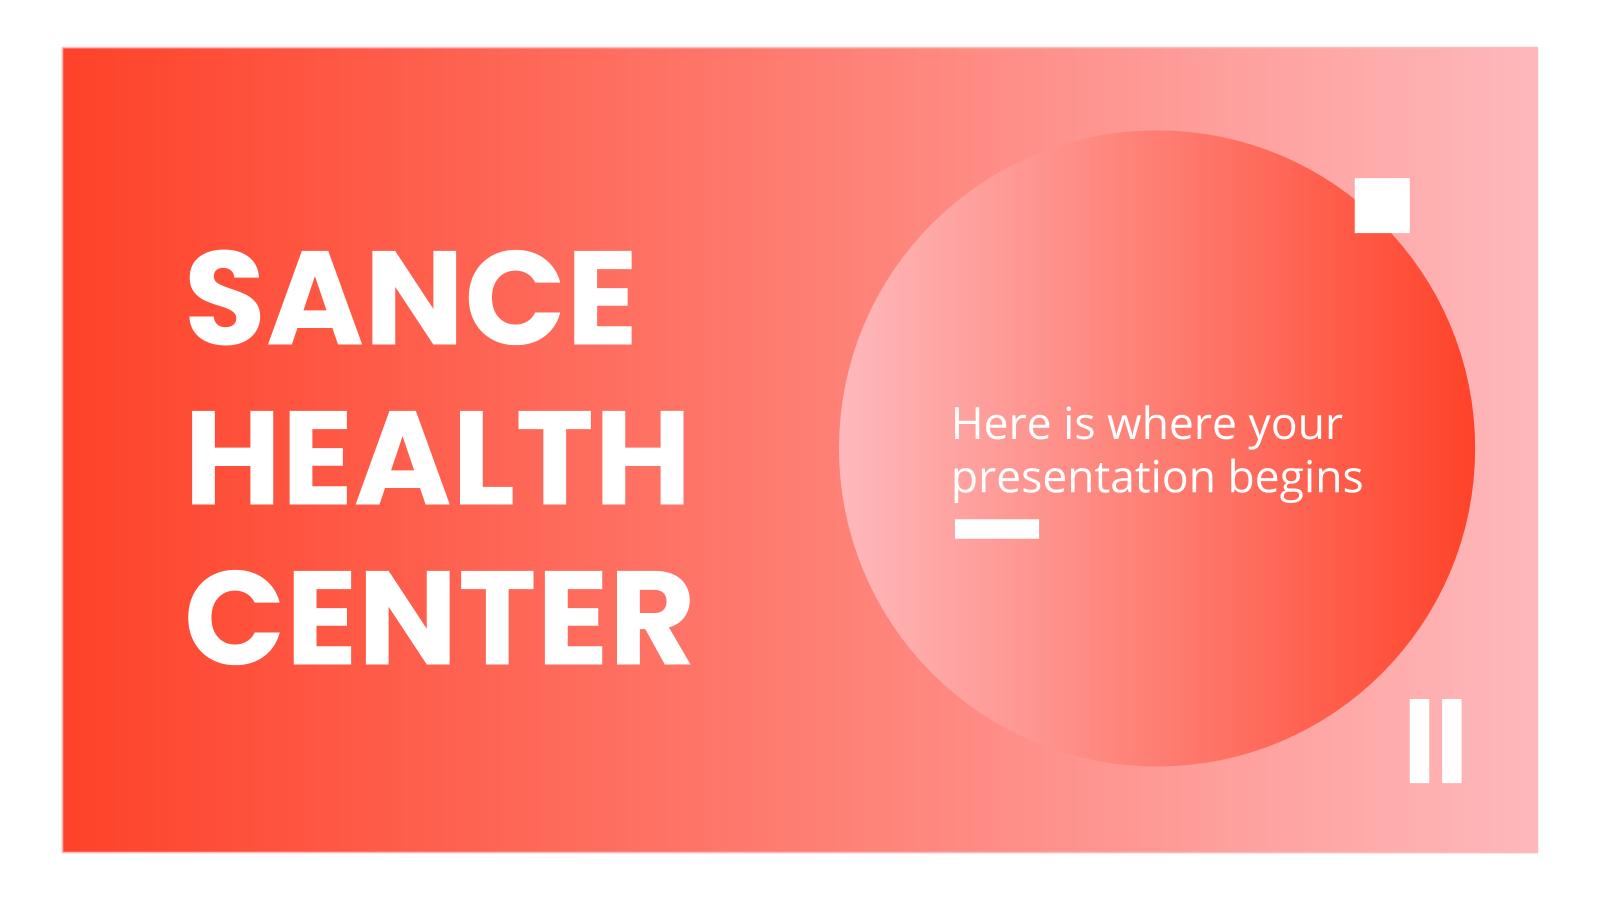 Sance Health Center presentation template